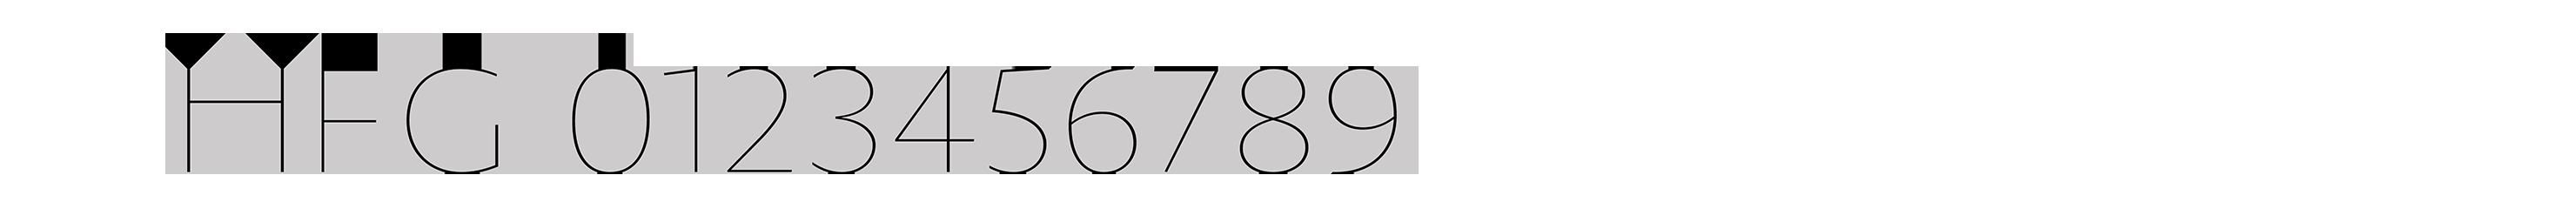 Typeface-Novel-Sans-Hairline-F14-Atlas-Font-Foundry